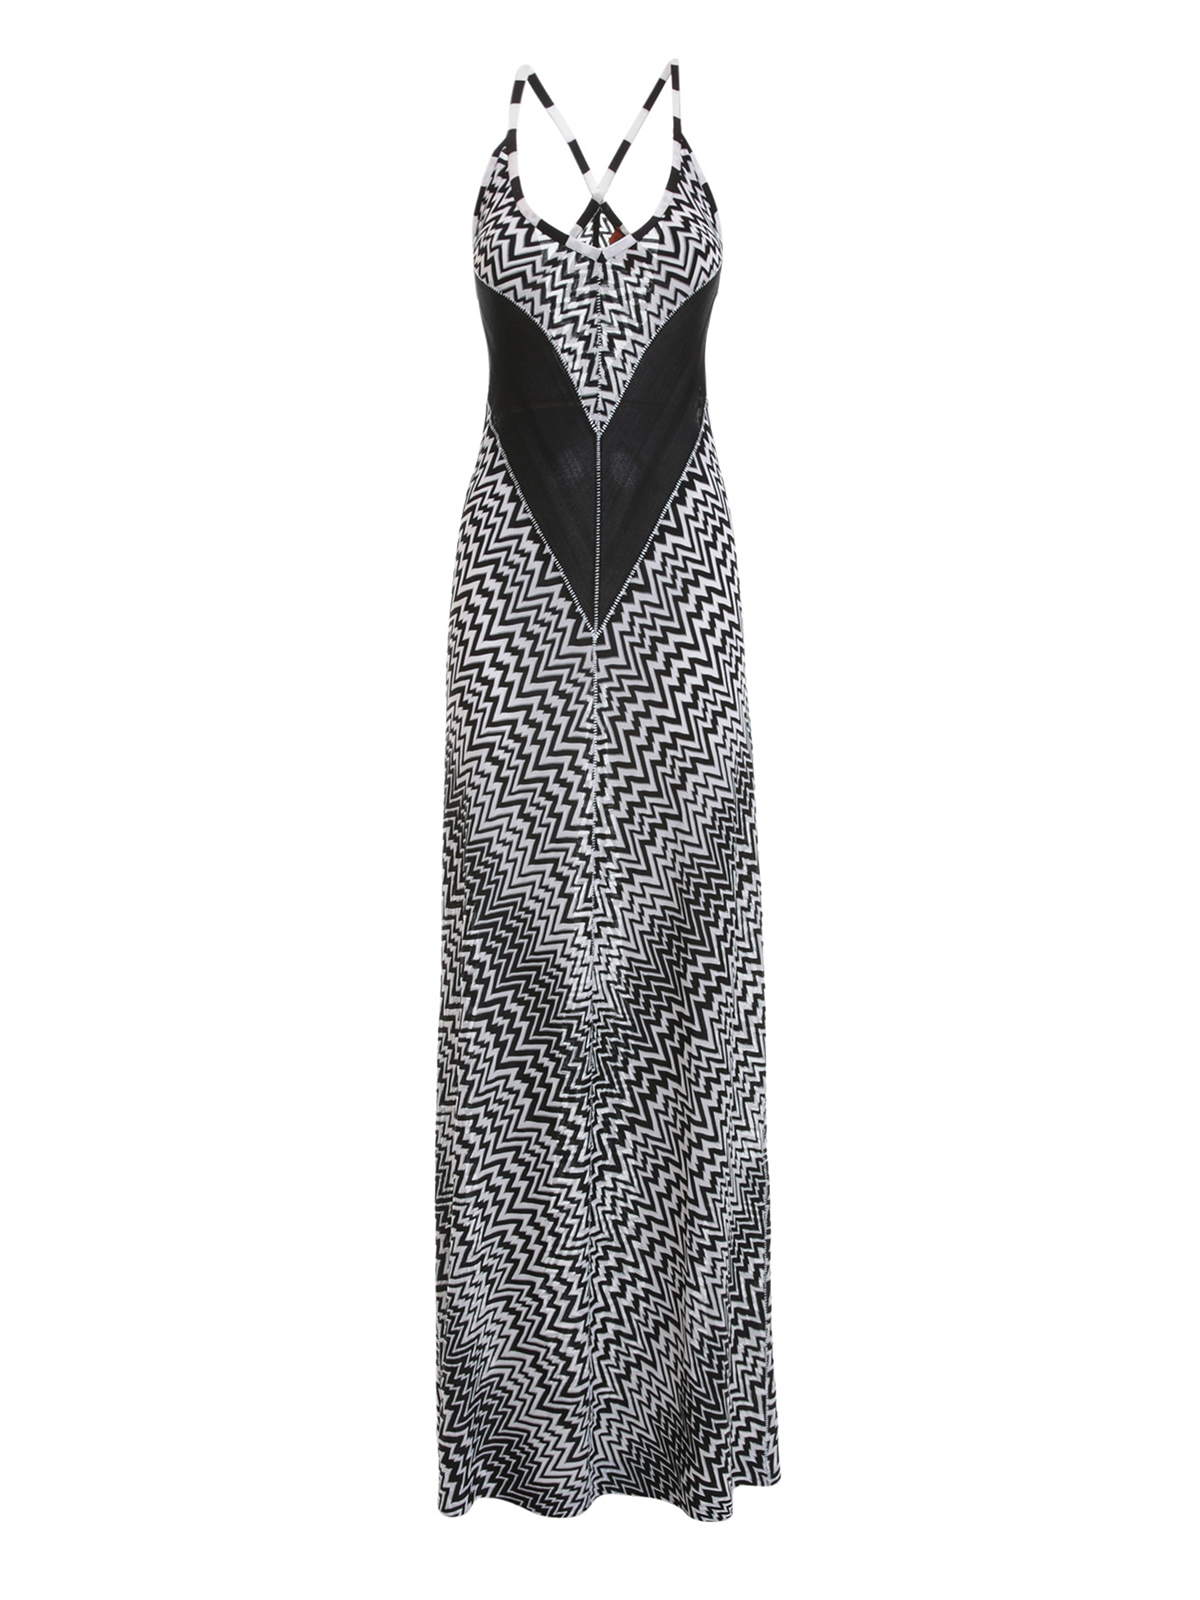 Missoni Evening Dresses - Homecoming Prom Dresses